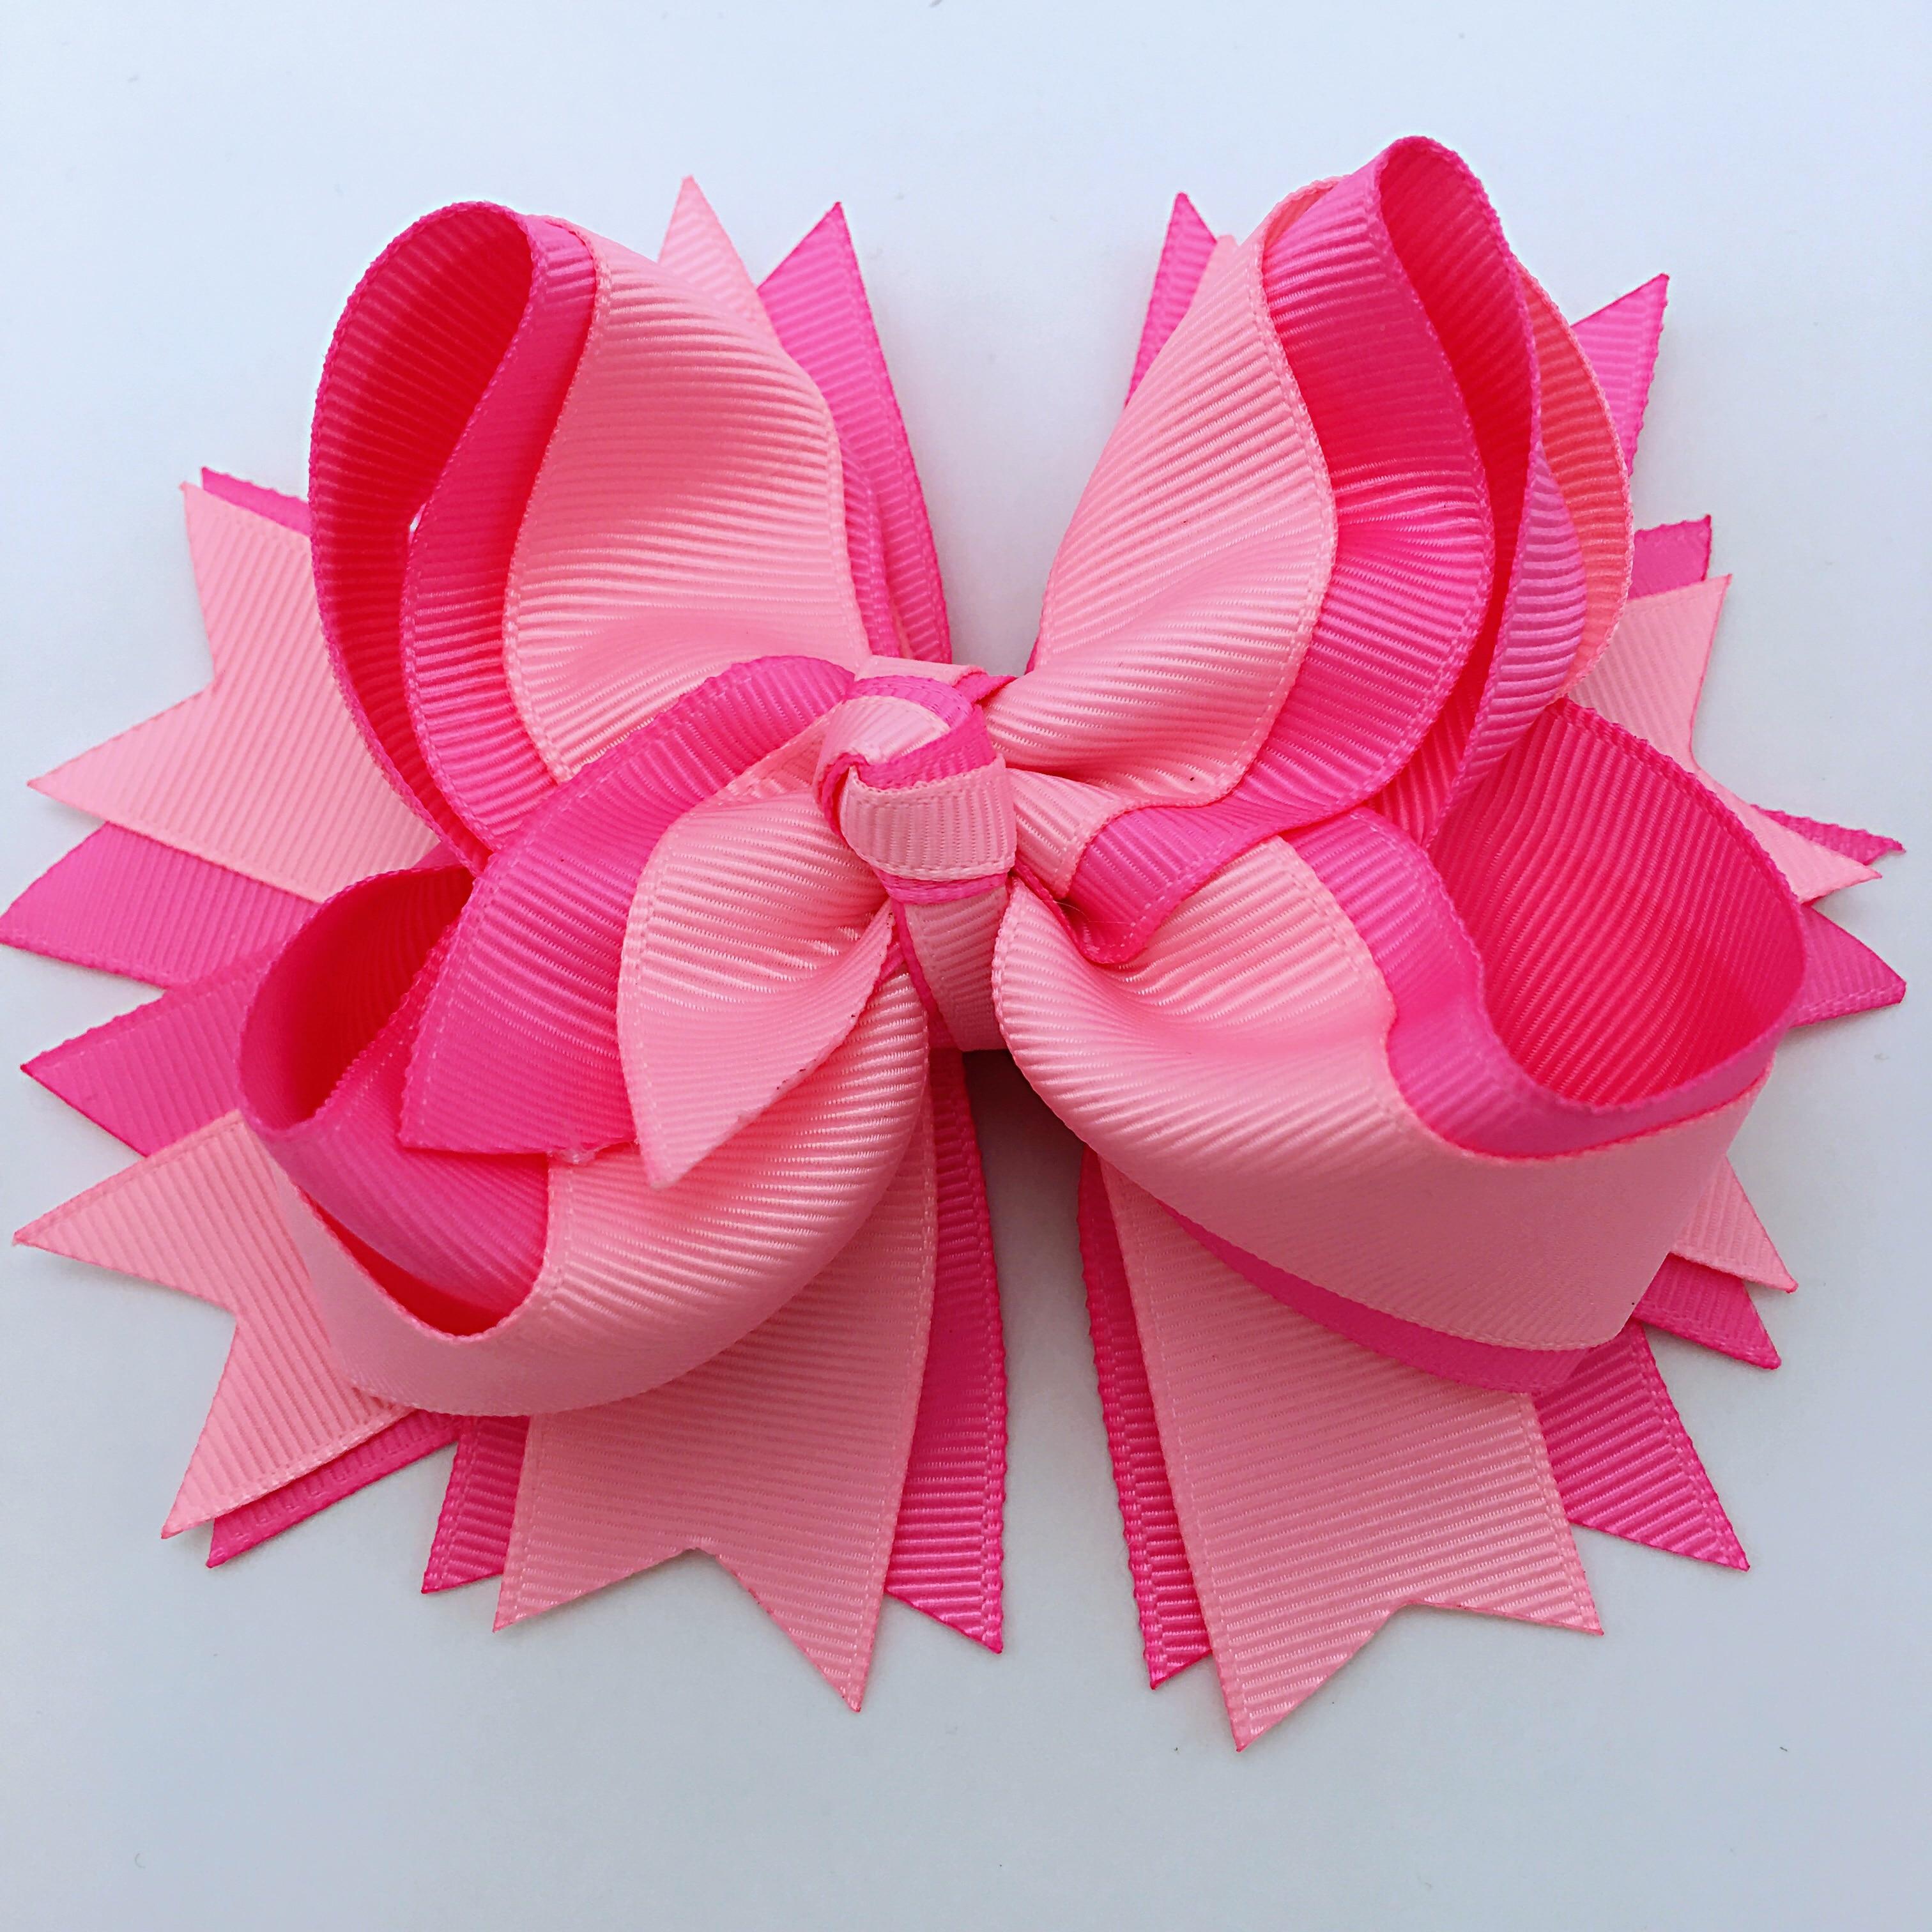 1PCS 5 Inches Solid Hair Bows for Girls Hair Clips Ribbon Bows Hairpins Multicolor Children   Headwear   Hair Accessories